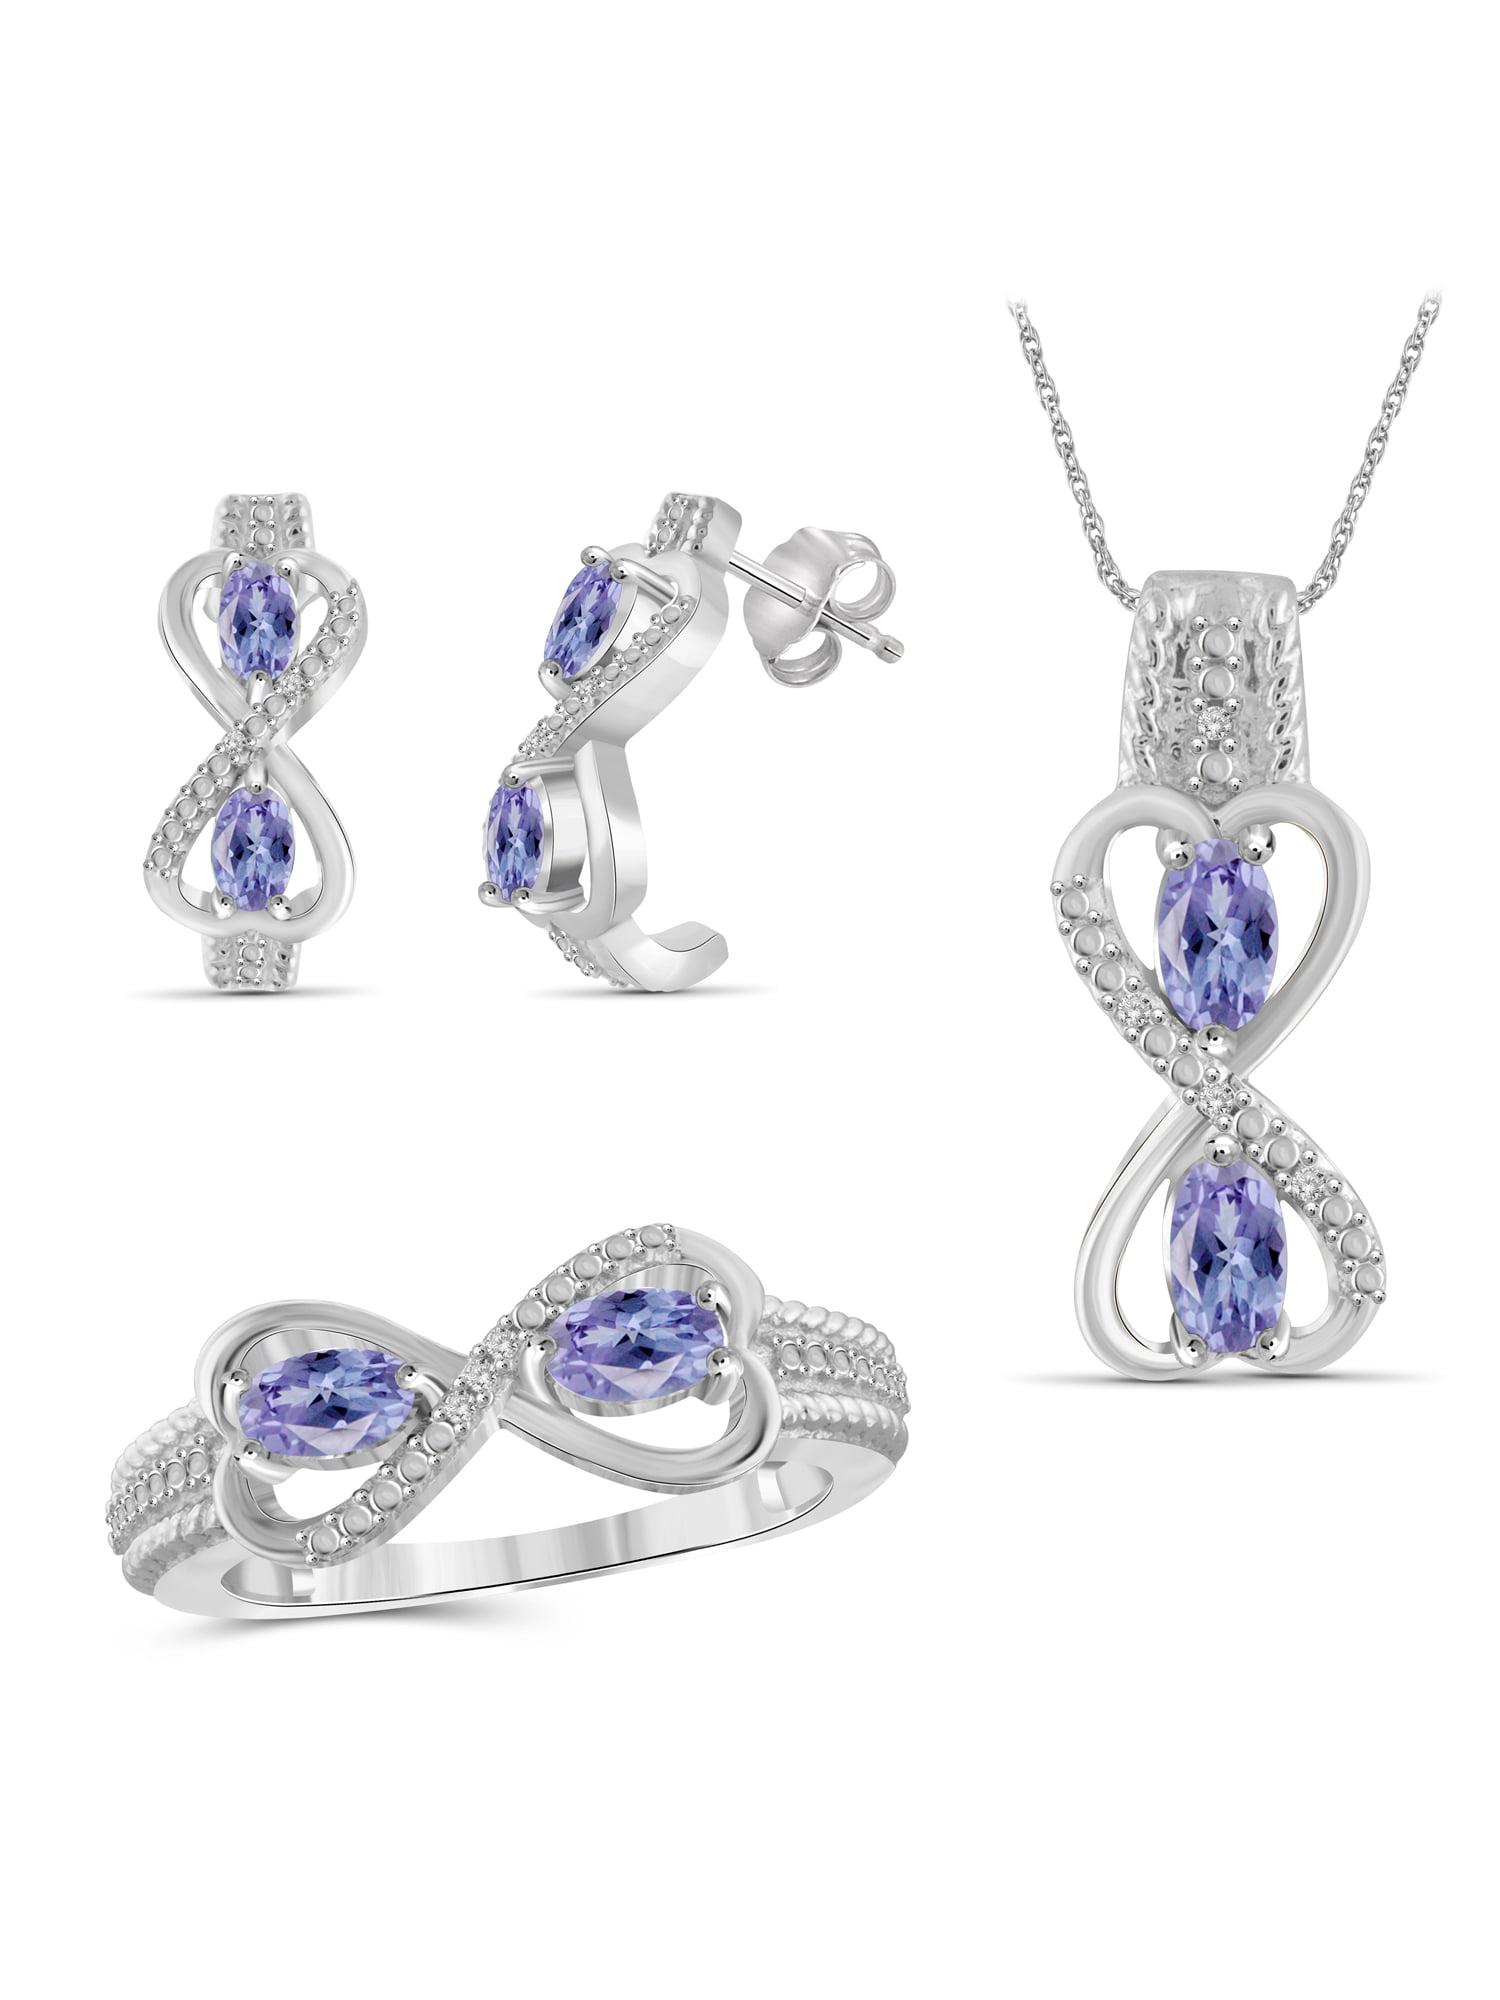 JewelersClub 2.00 Carat T.G.W. Tanzanite And White Diamond Accent Sterling Silver 3-Piece Jewelry set by JewelersClub